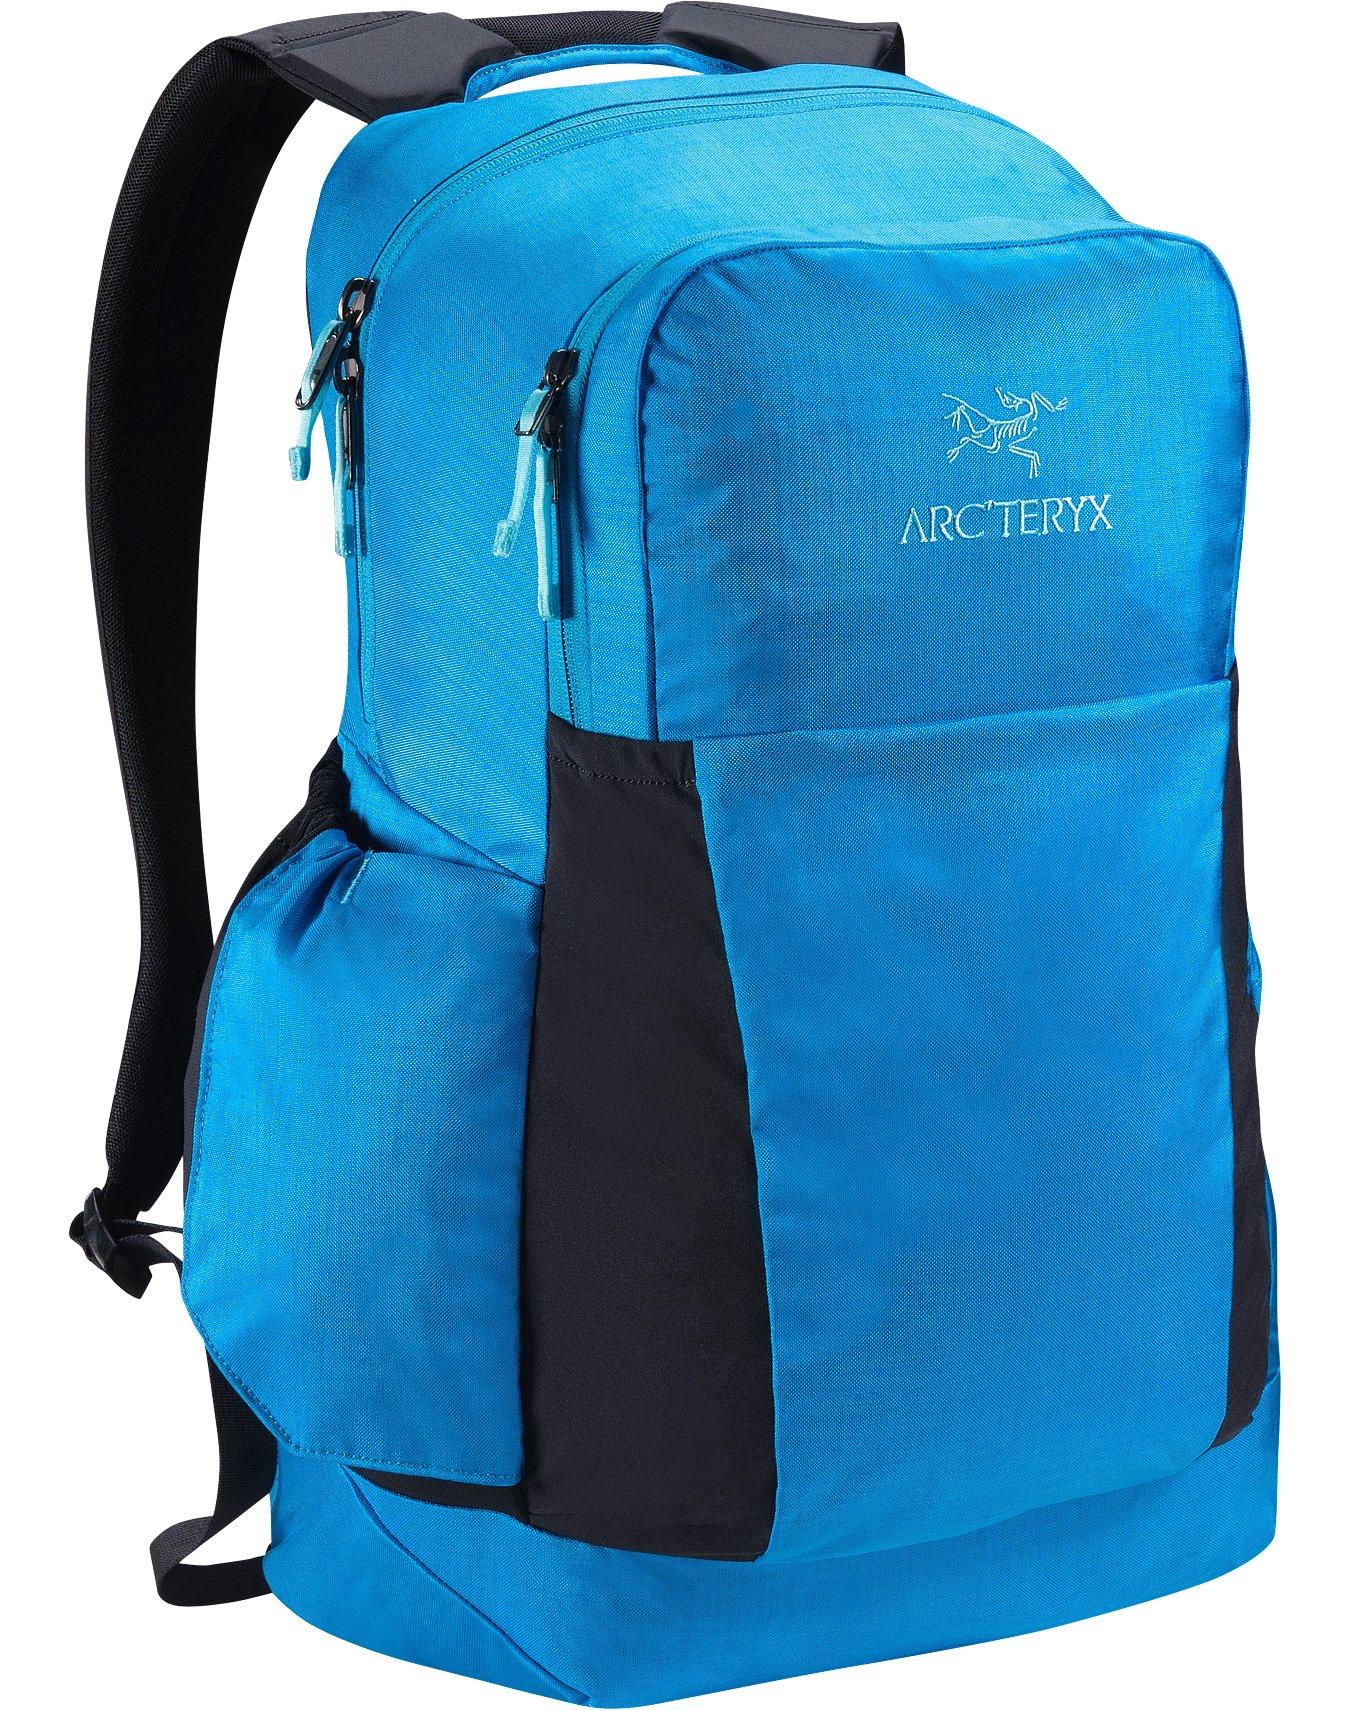 Arcteryx Kitsilano Backpack Adriatic Blue 20L by Arc'teryx